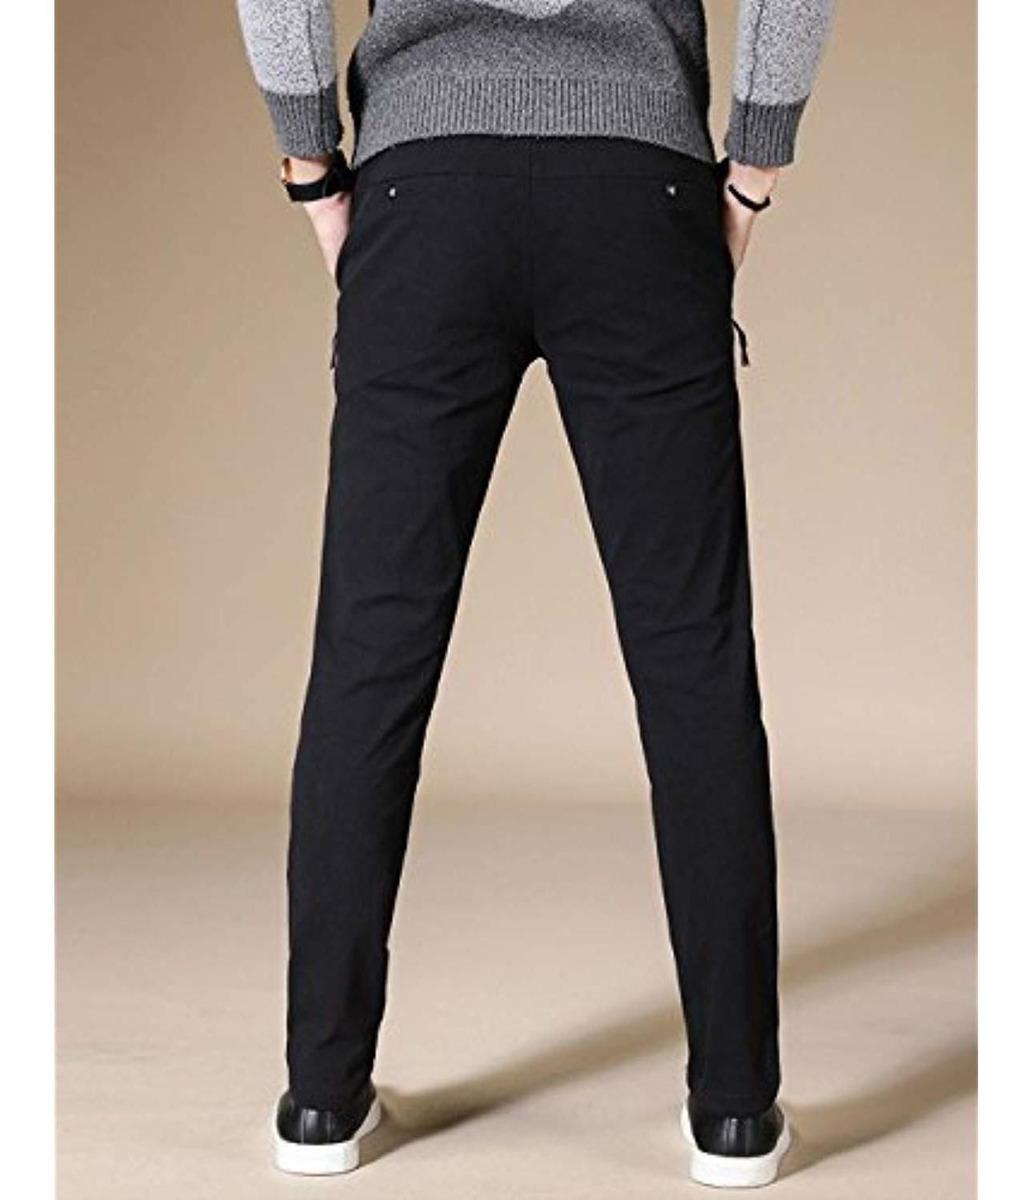 VEGORRS Mens Solid Loose Fit Casual Pants 528pants